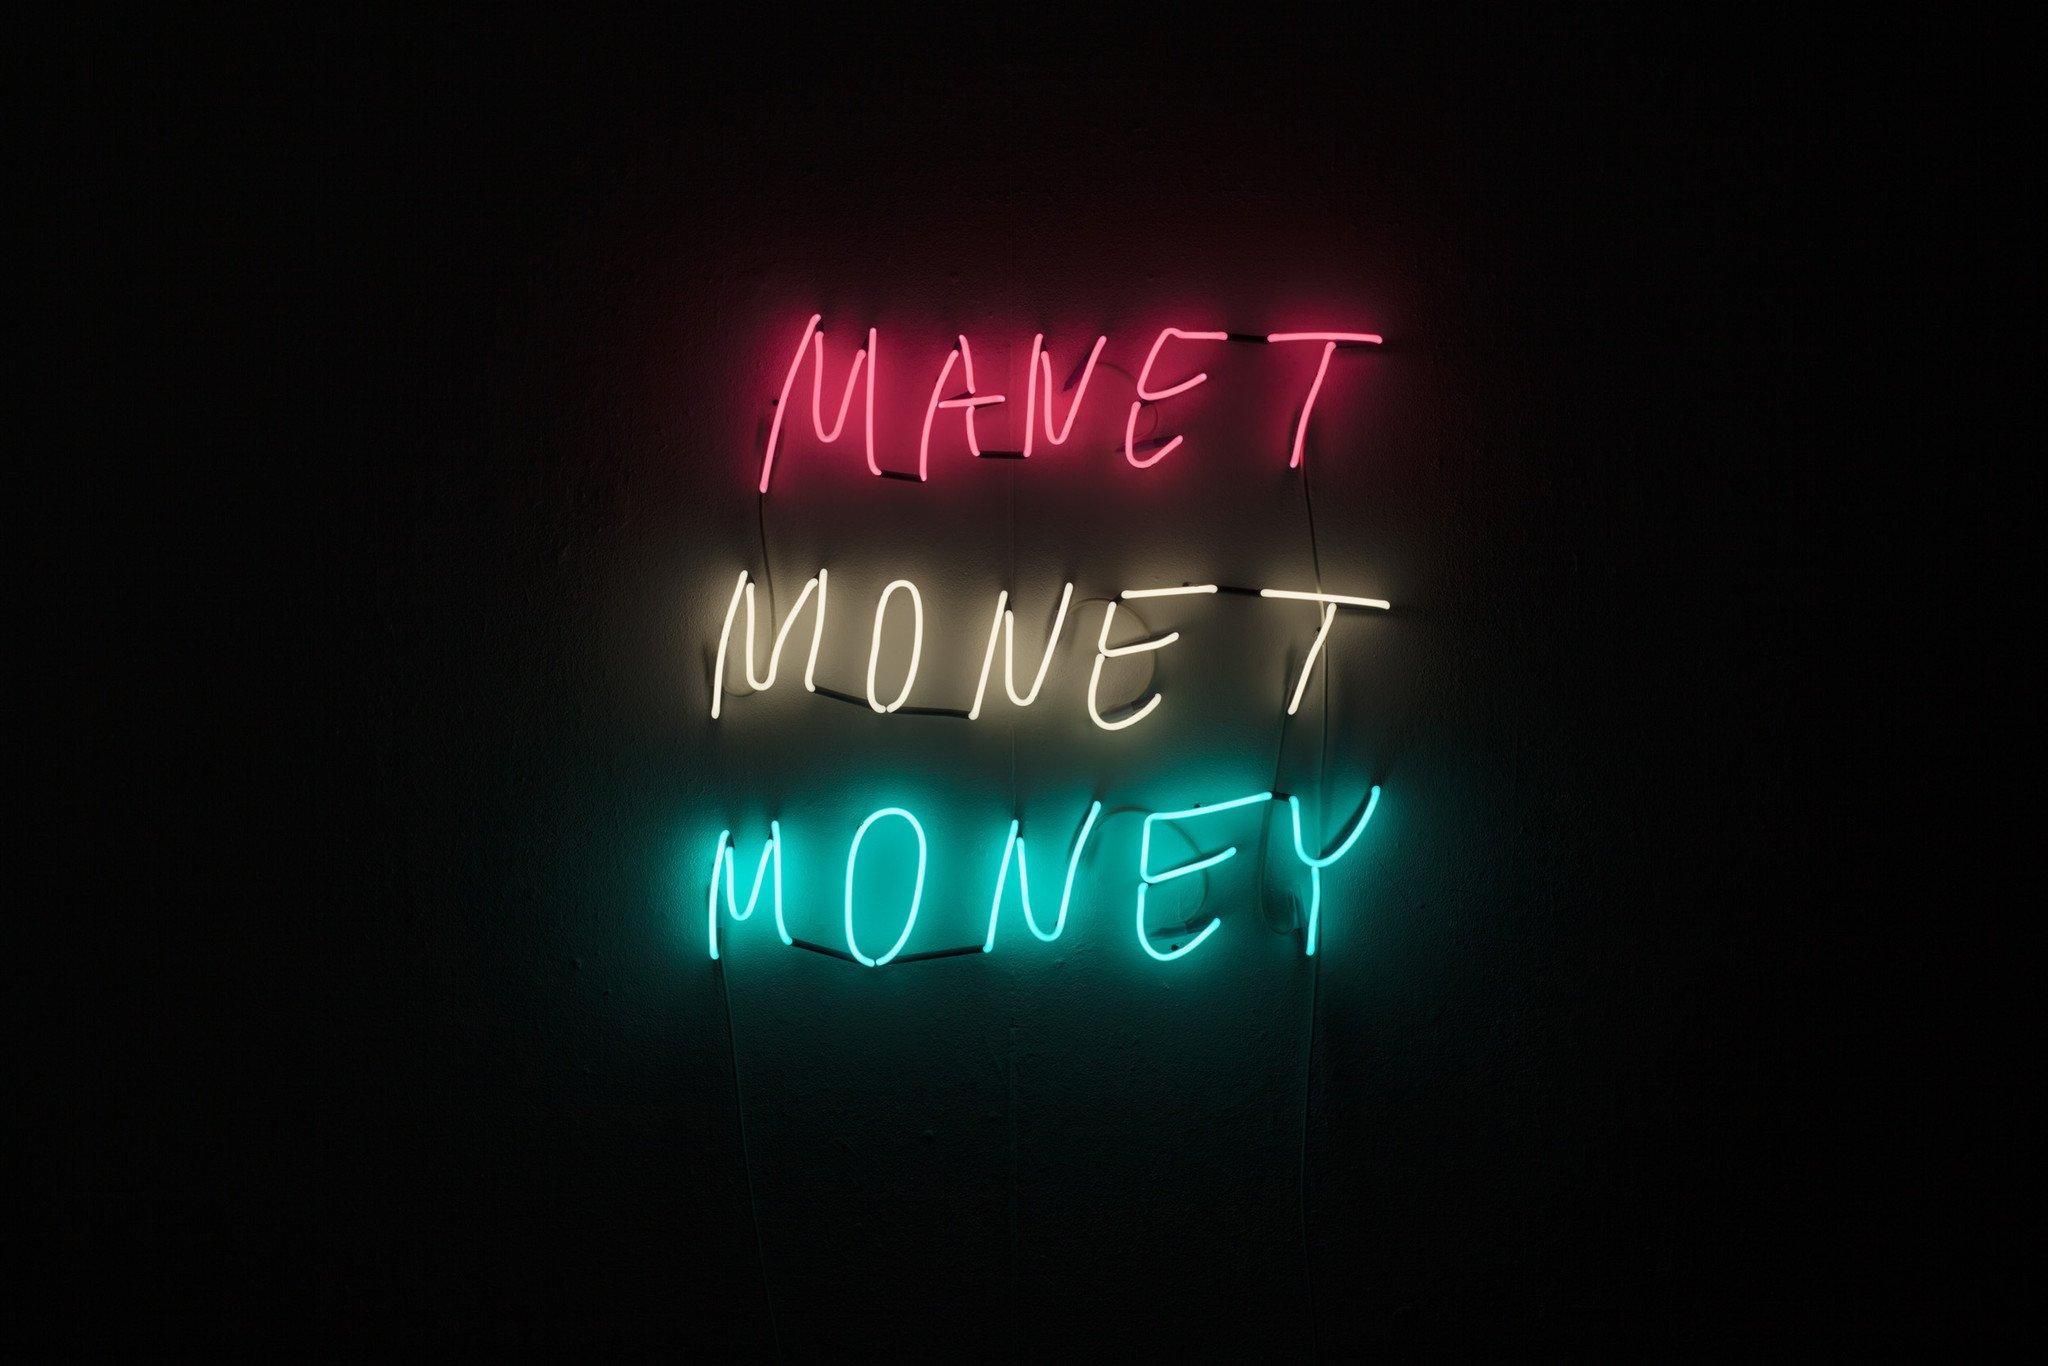 ART N MORE, Manet Monet Money, 2014, neon sign, 98 cm x 90 cm